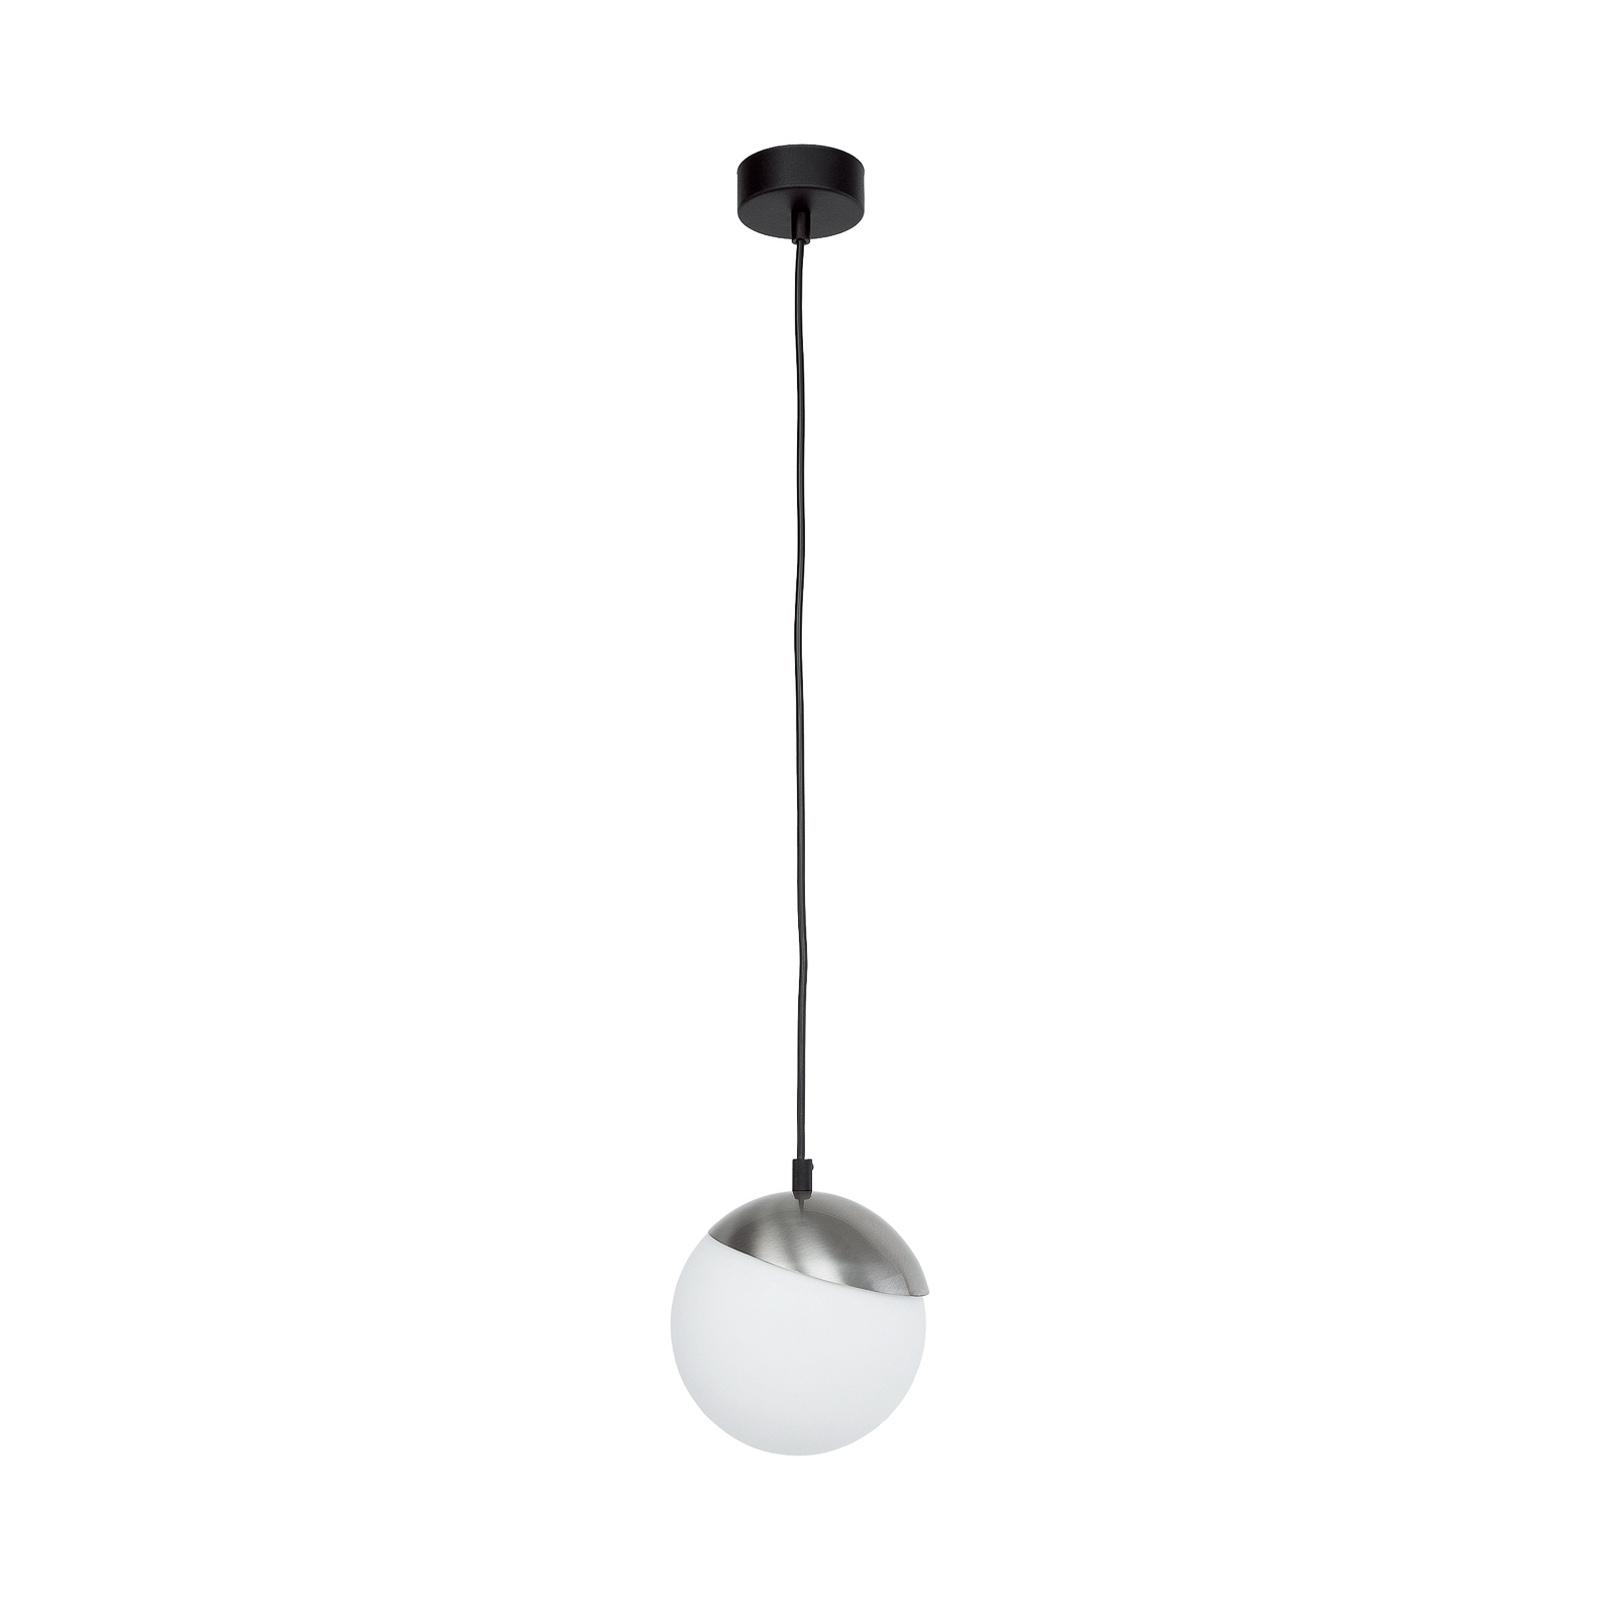 Suspension Torbole, opale/nickel, à 1 lampe